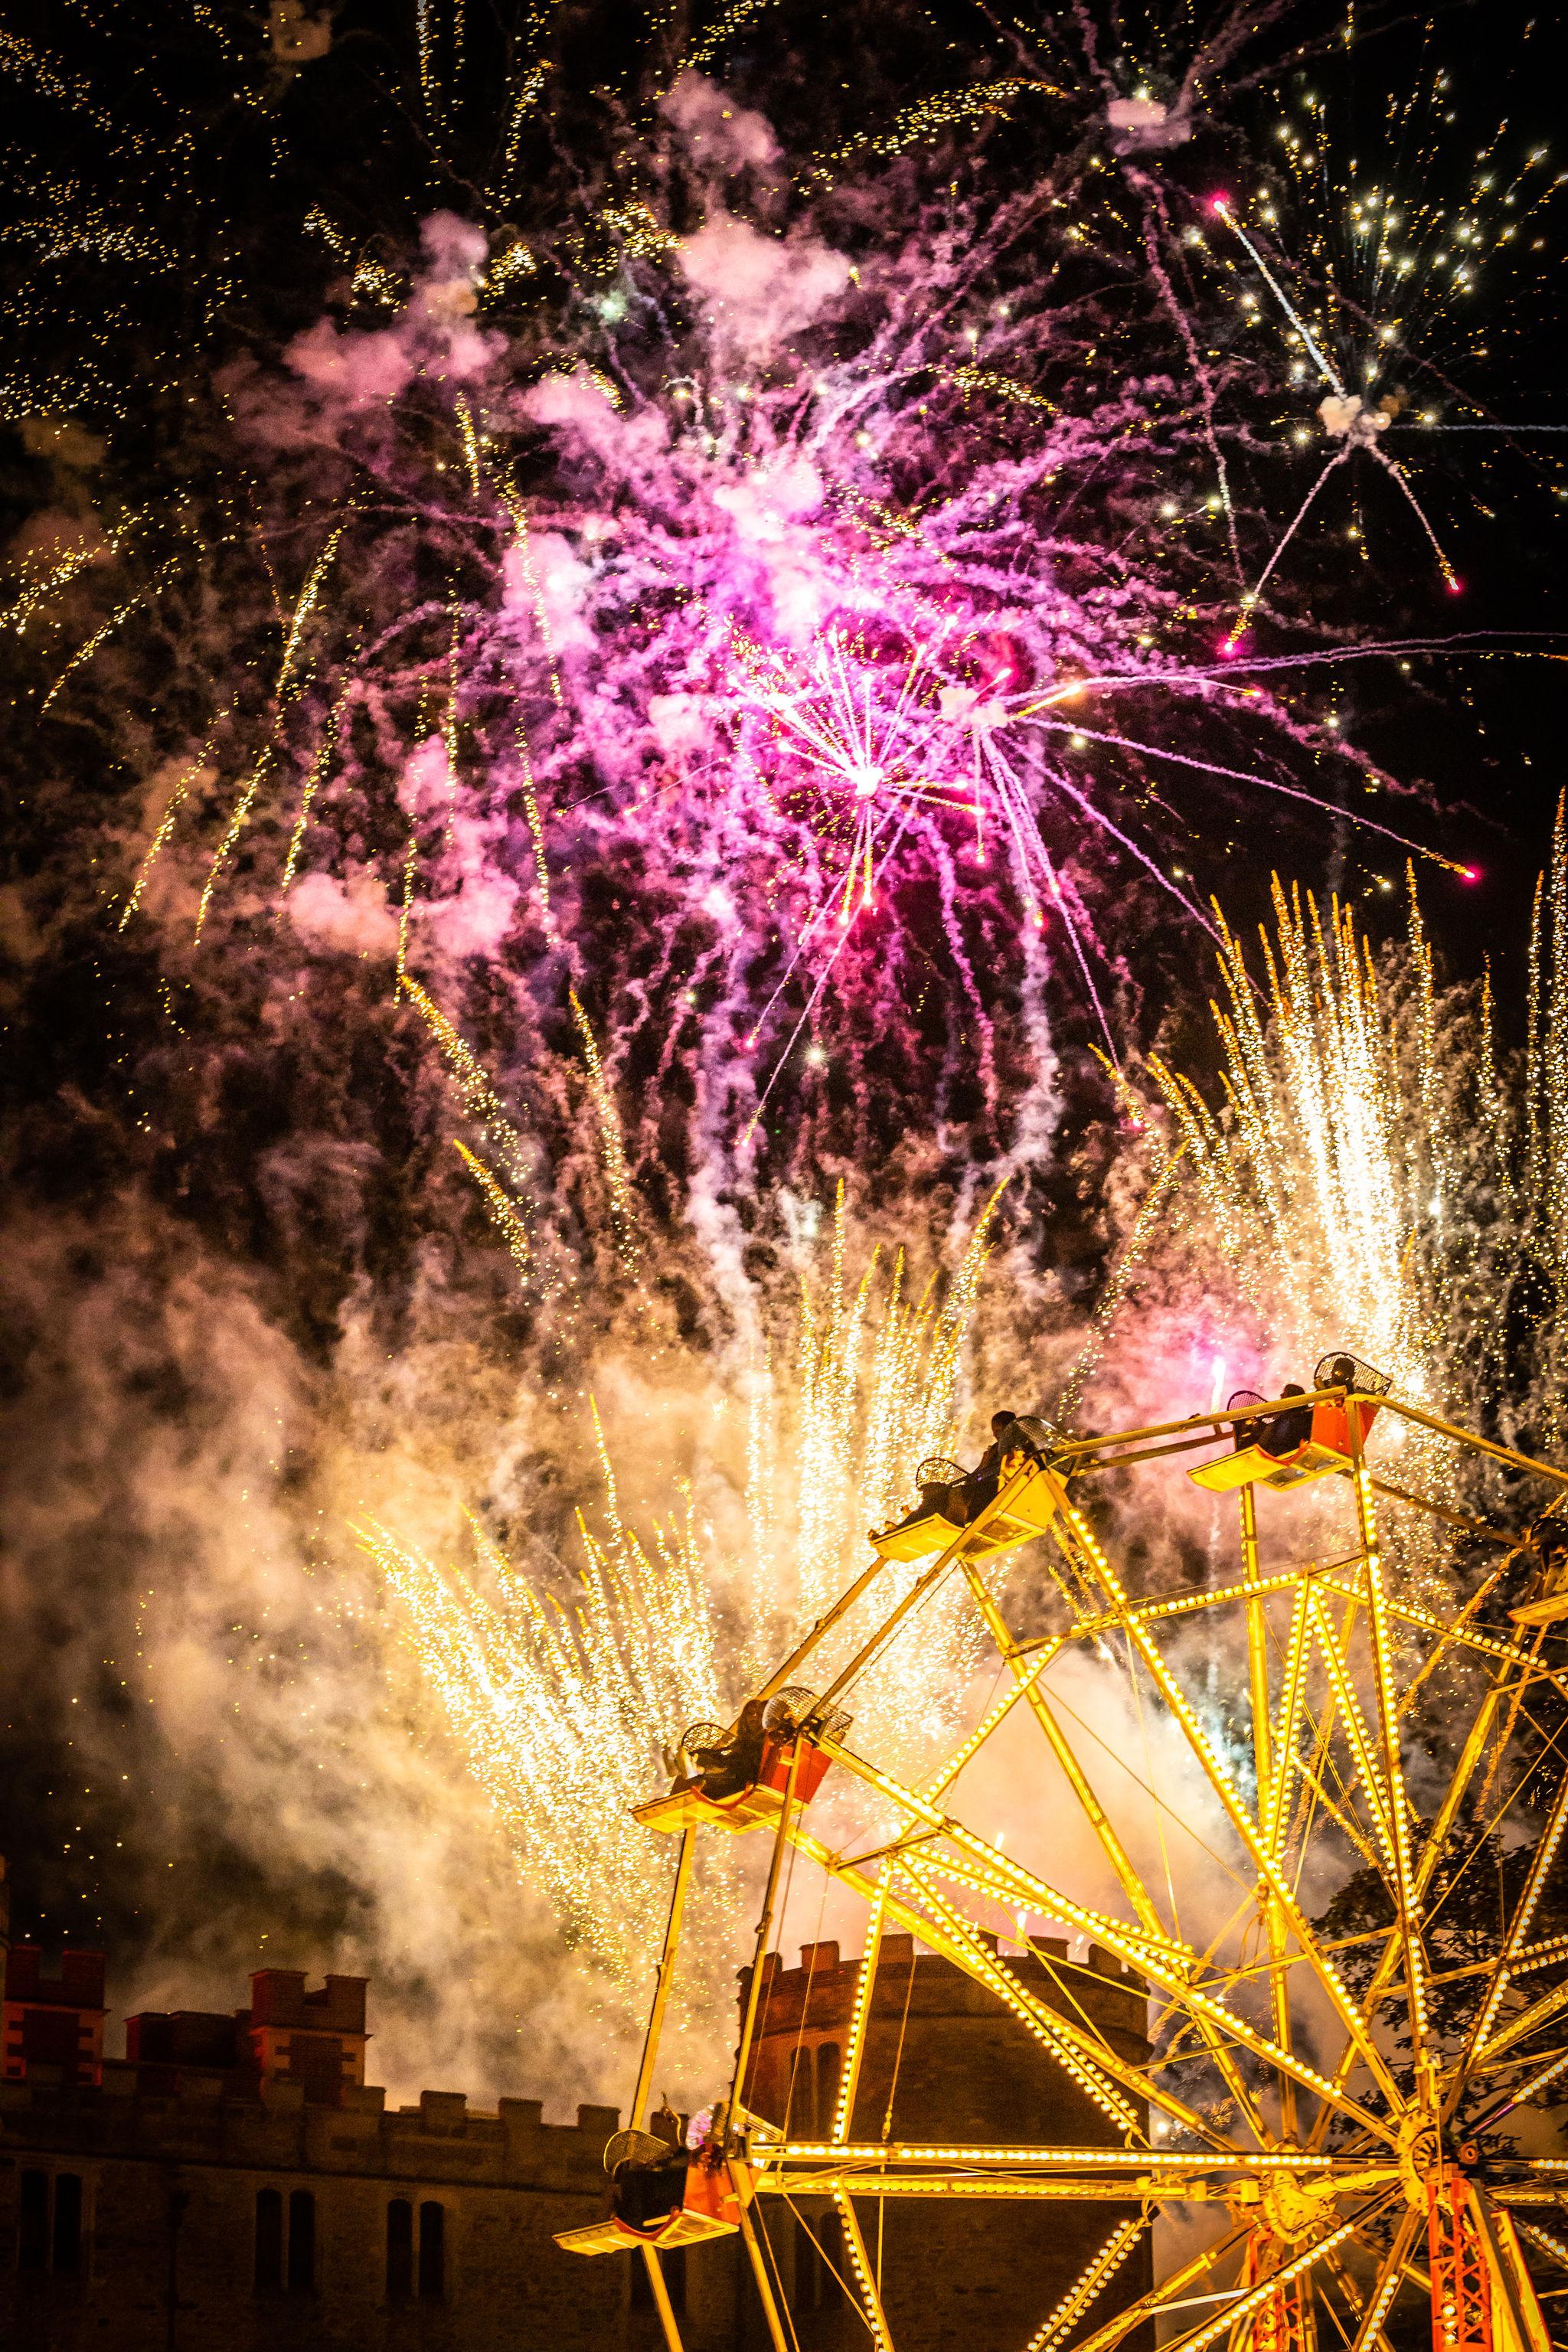 Sun_CastleStage_Fireworks_VF-5050.jpg